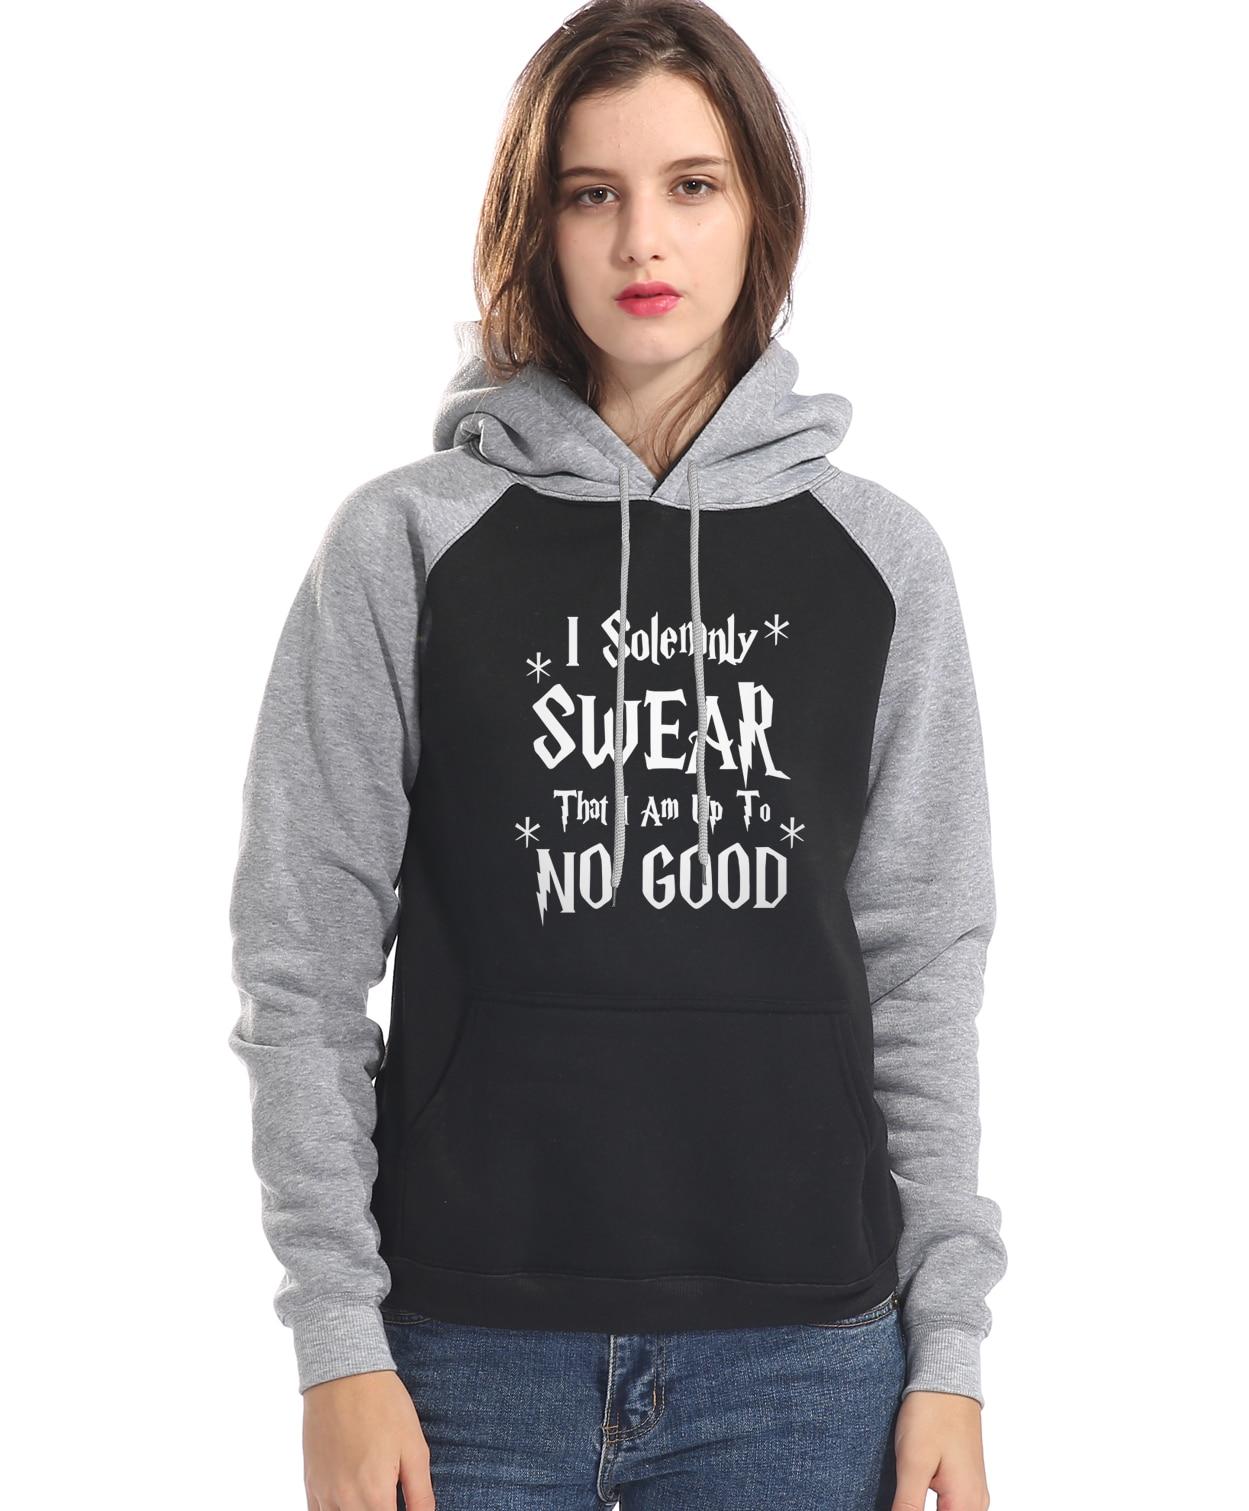 Pulóveres 2019 Otoño Invierno raglán Manga I jurly que I Am Up To No Good hoodies mujeres moda hip-hop Sudadera con capucha